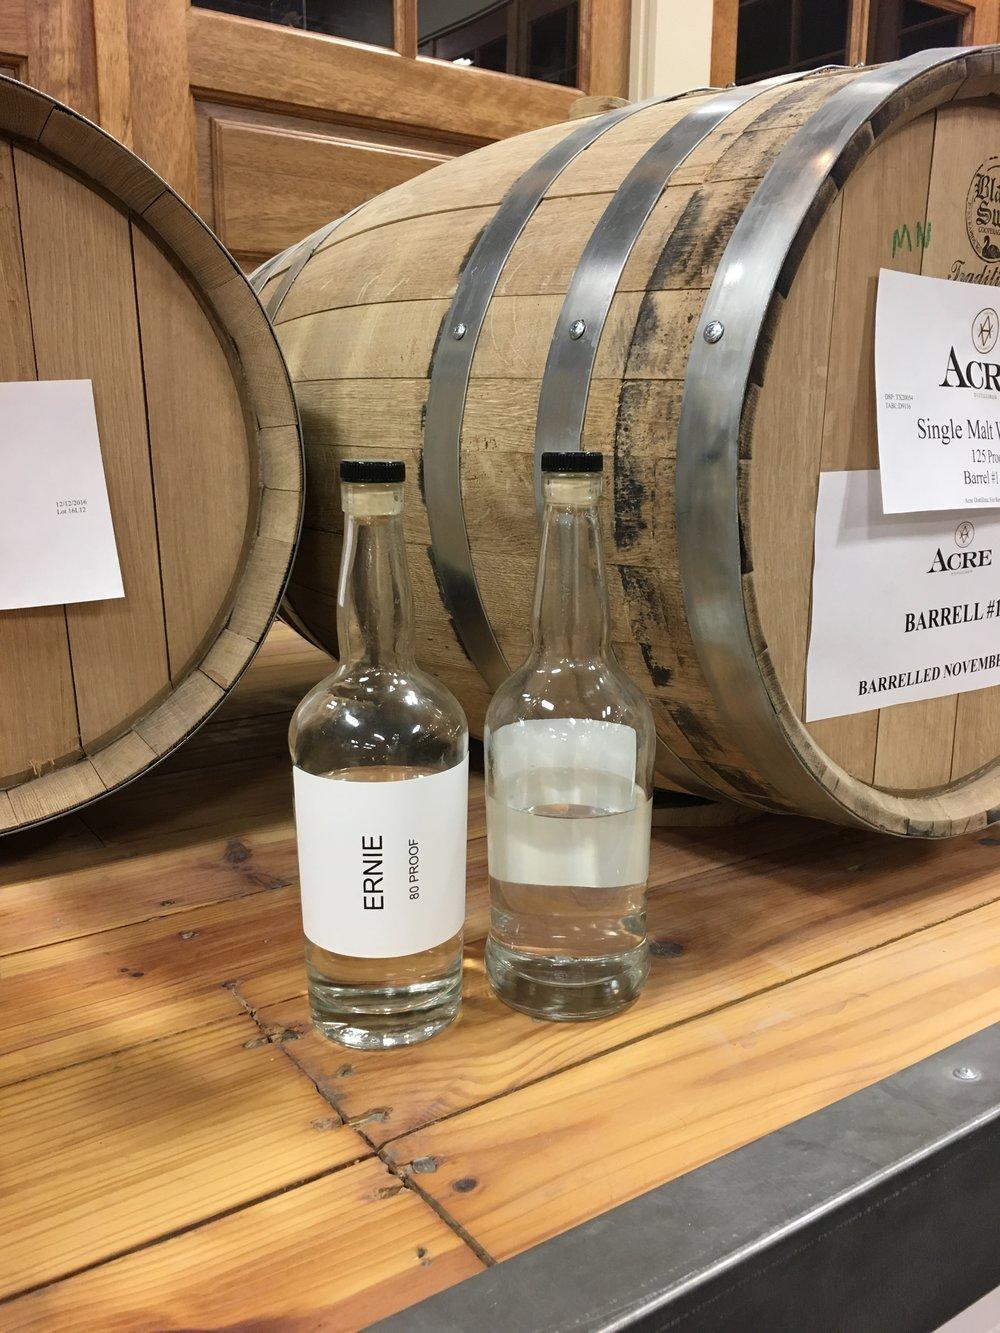 Acre-distillery-gin.jpg